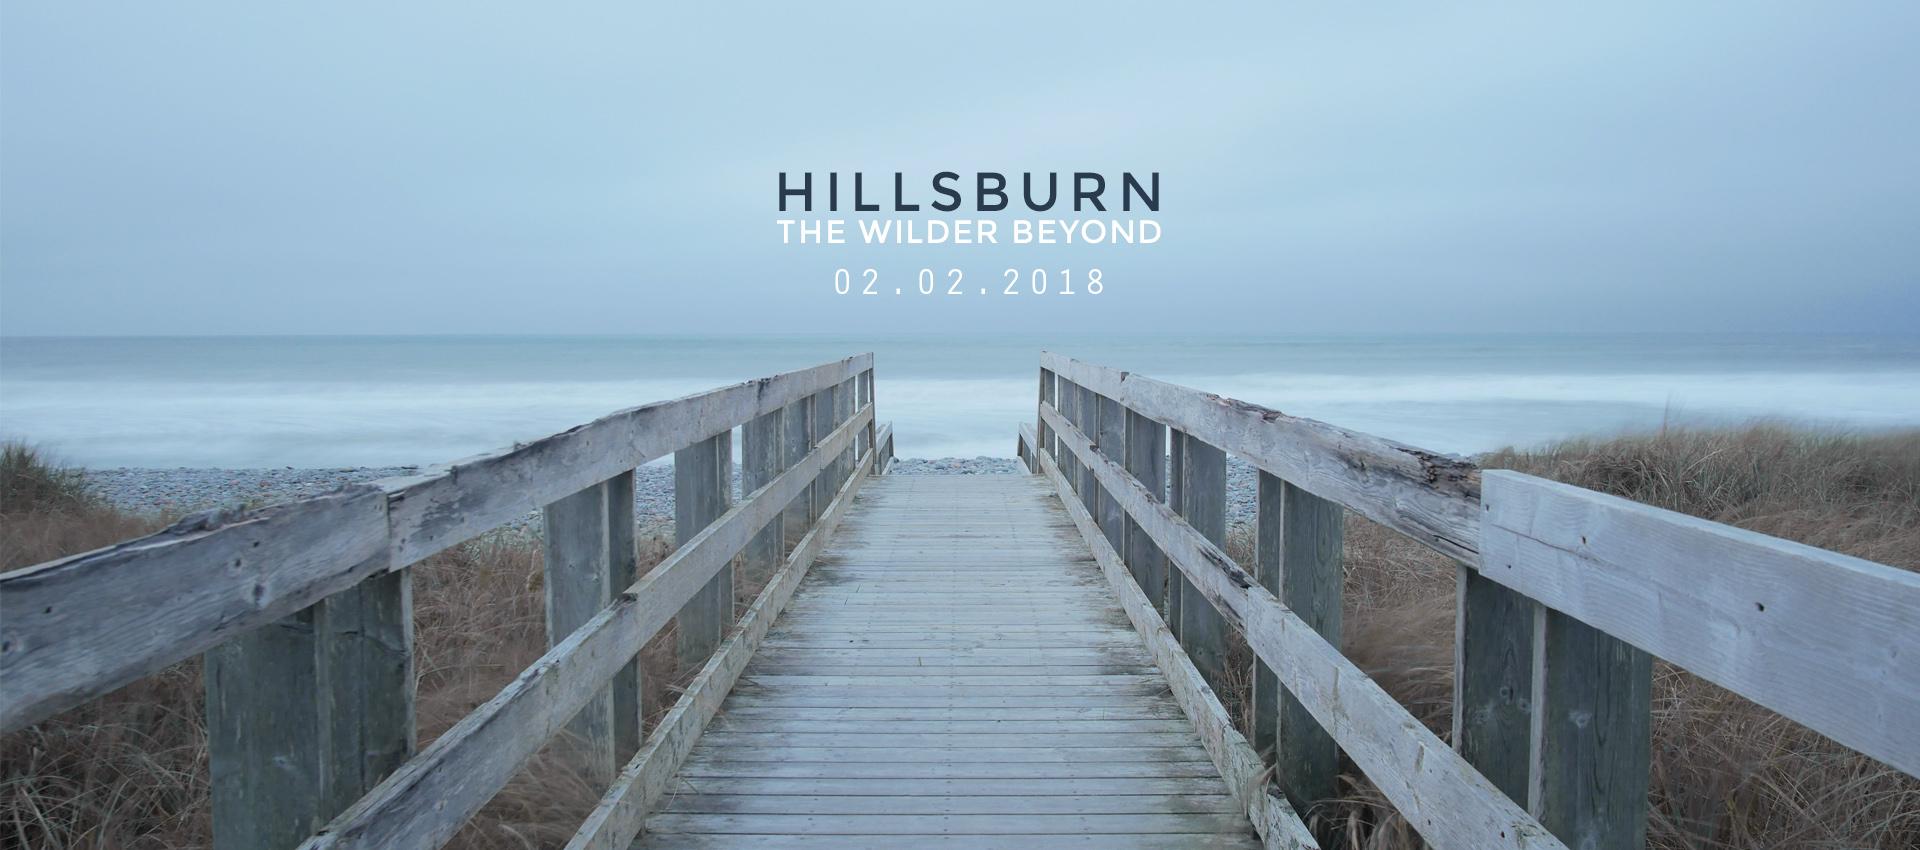 Hillsburn - The Wilder Beyond - Out February 2, 2018